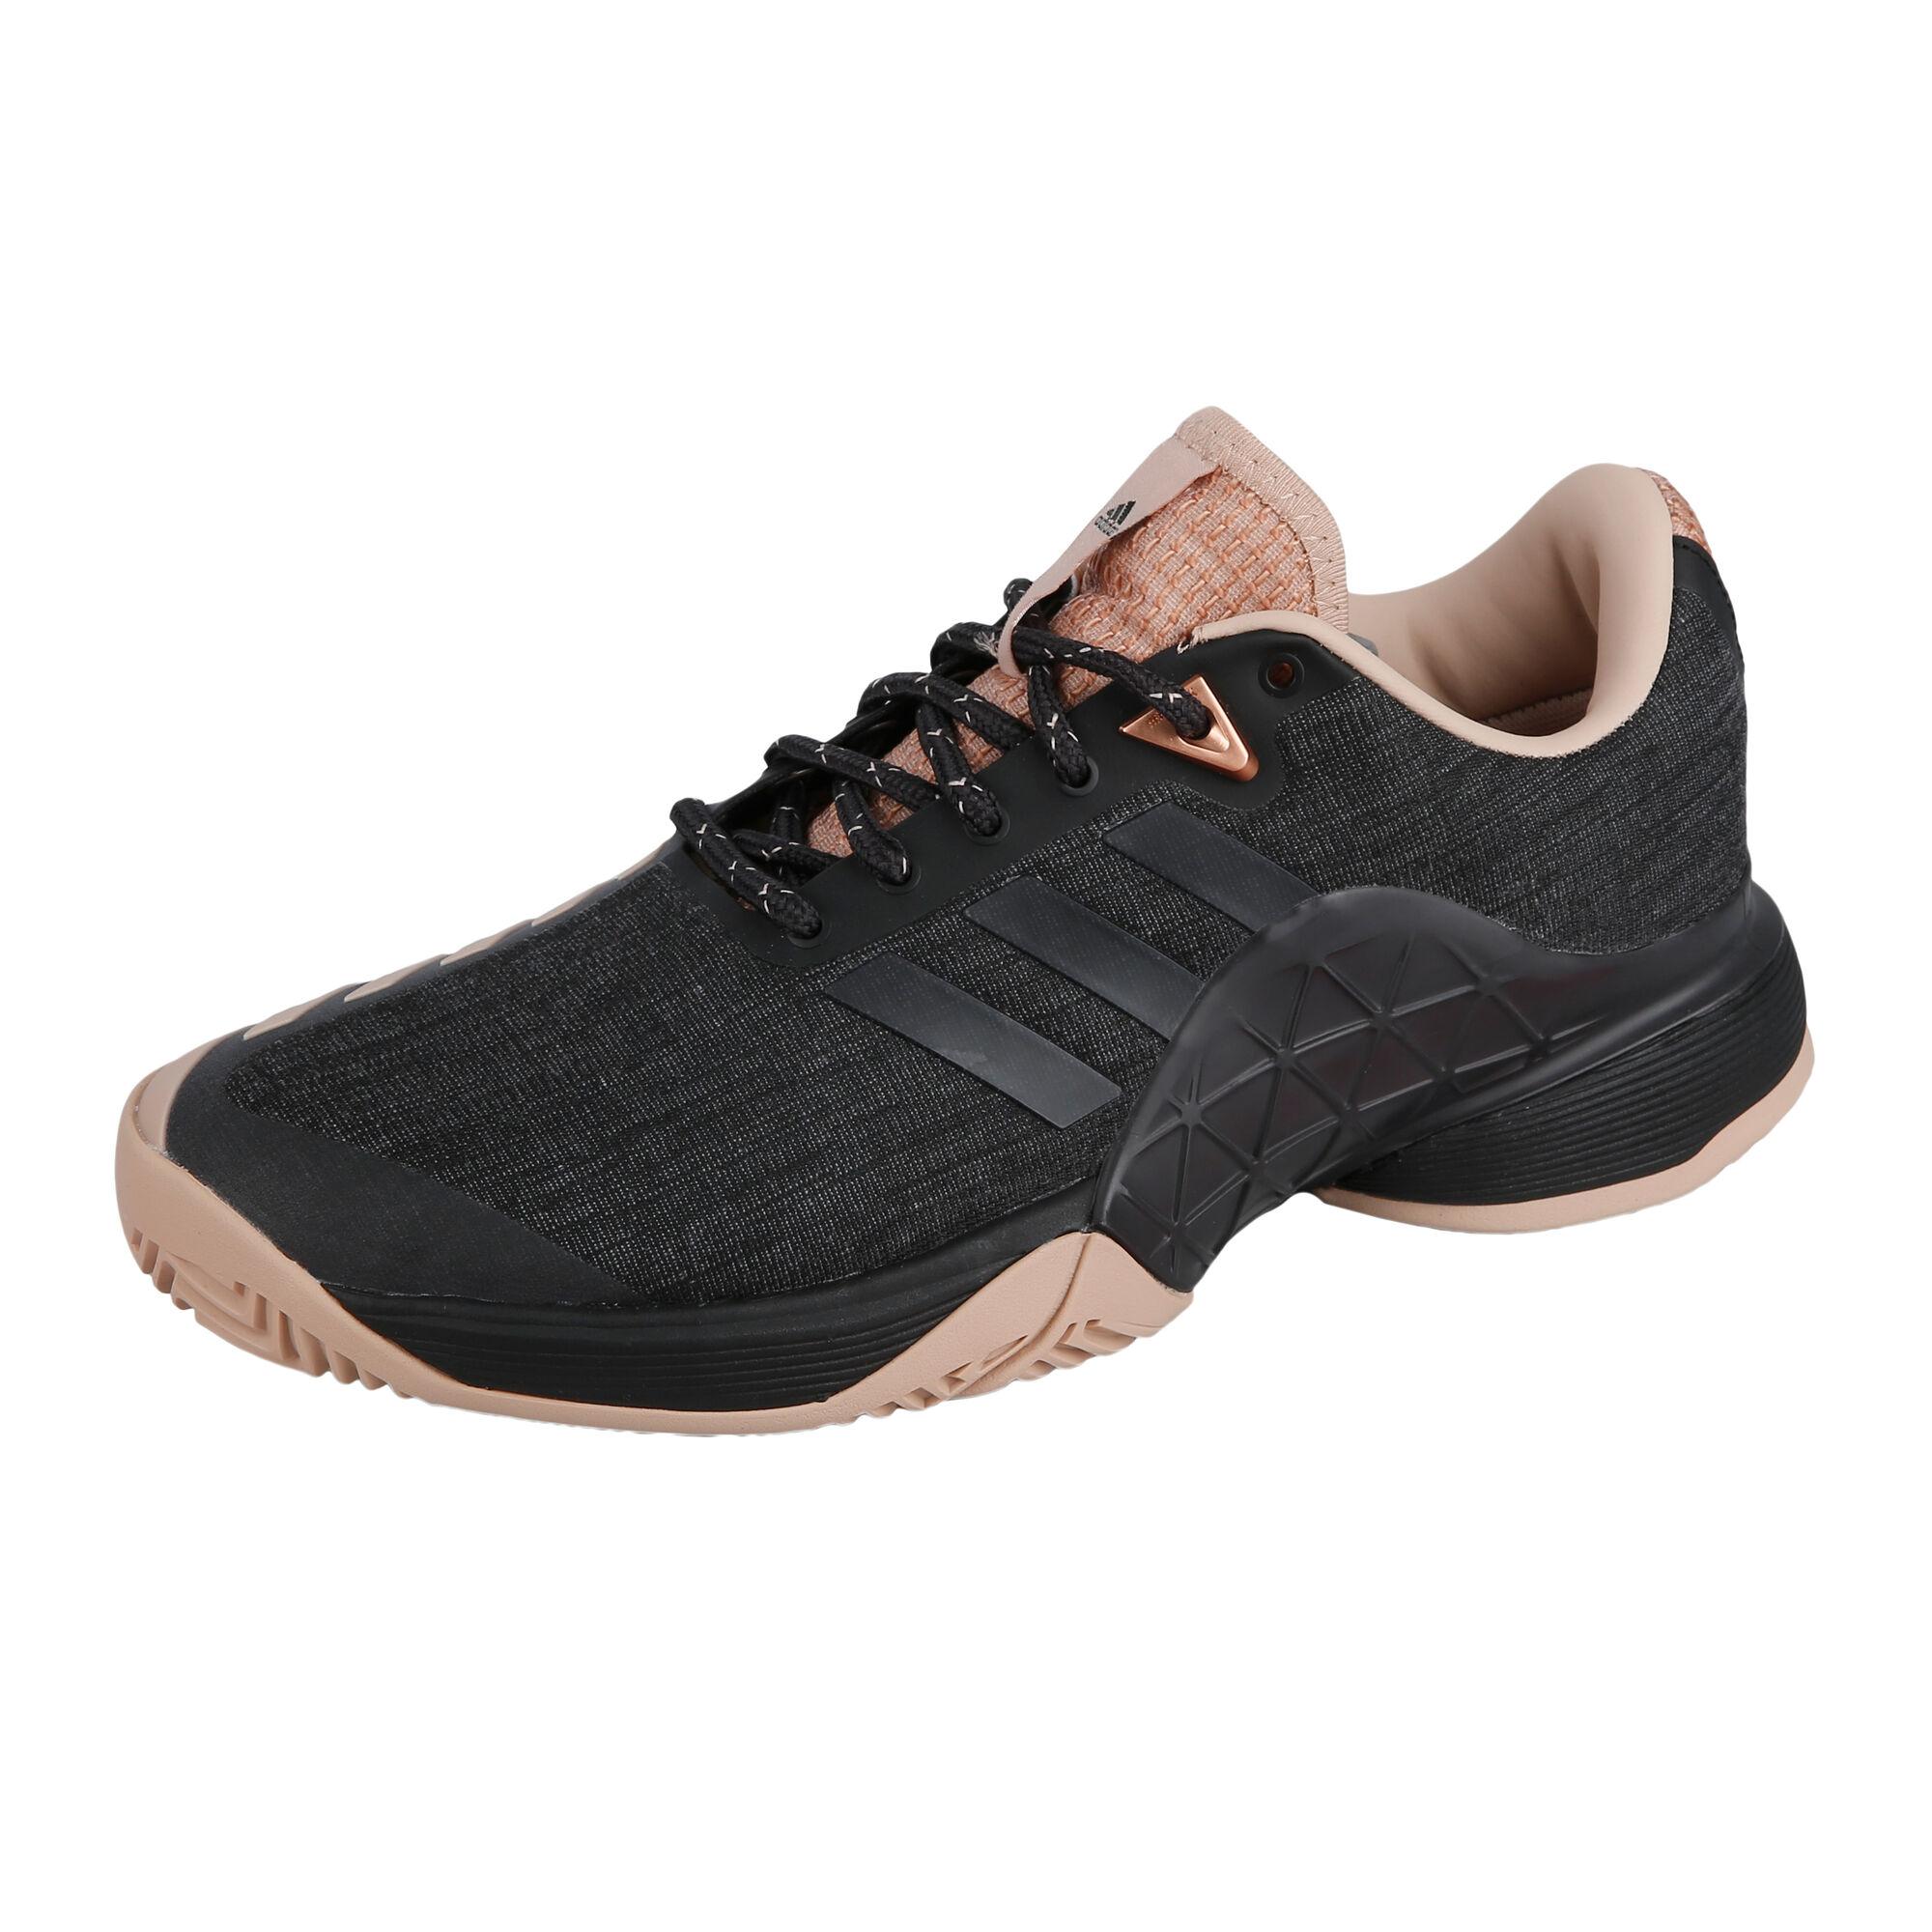 sports shoes b0349 e9033 Barricade 2018 Limited Women Barricade 2018 Limited Women ...